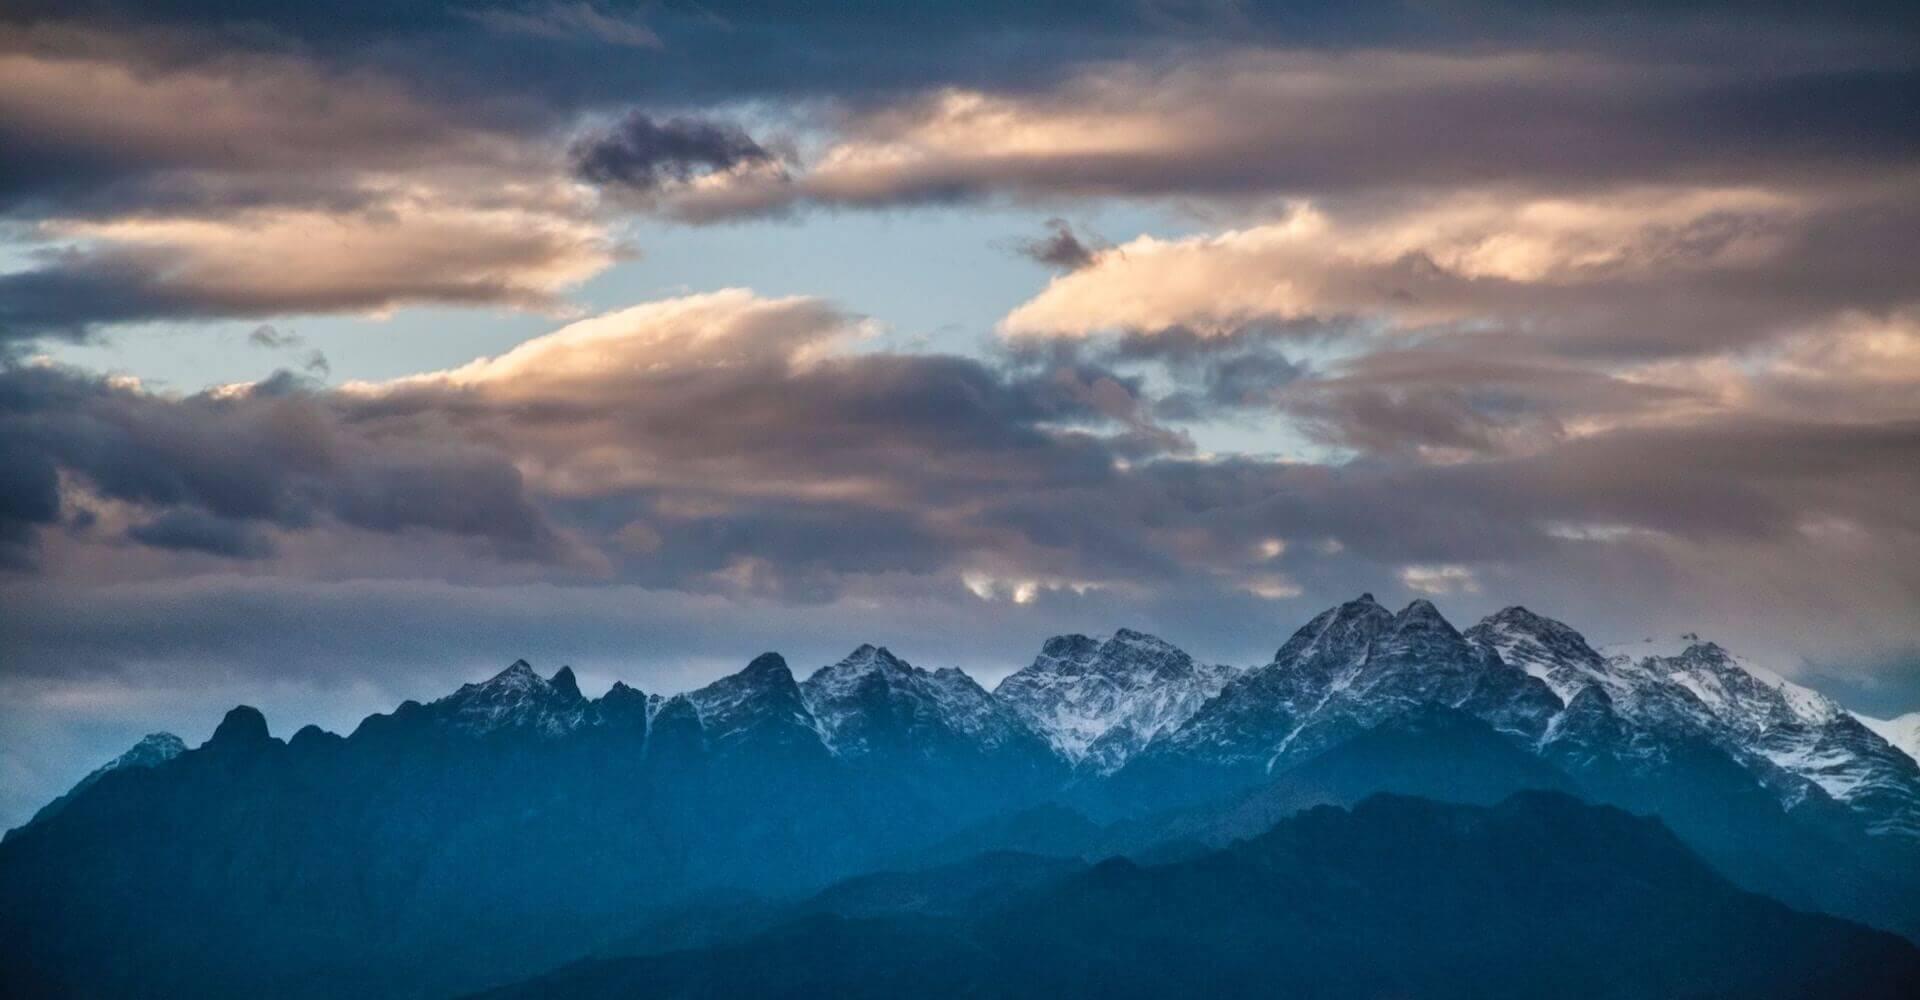 Bergen en lucht boven Kashan in Iran